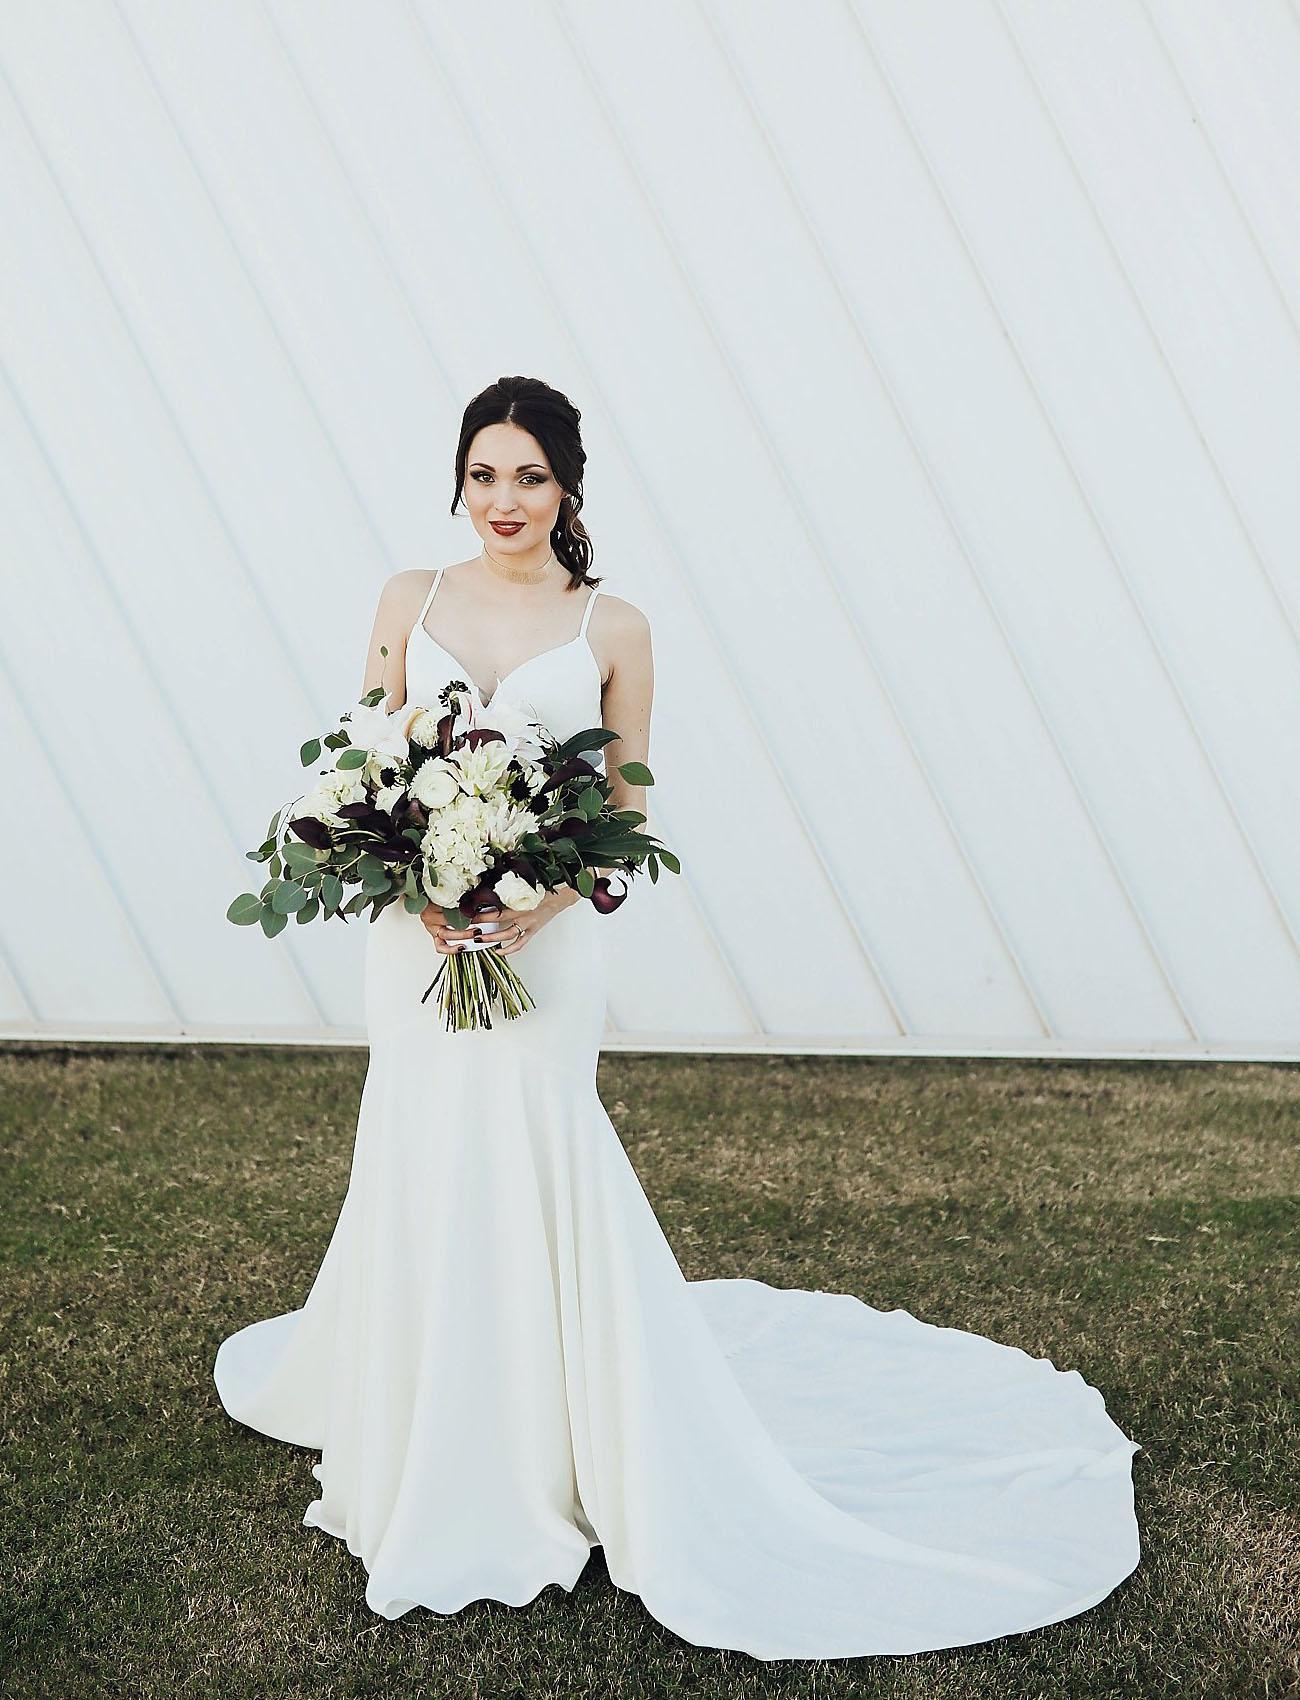 Prescott Bridal Wedding Dress